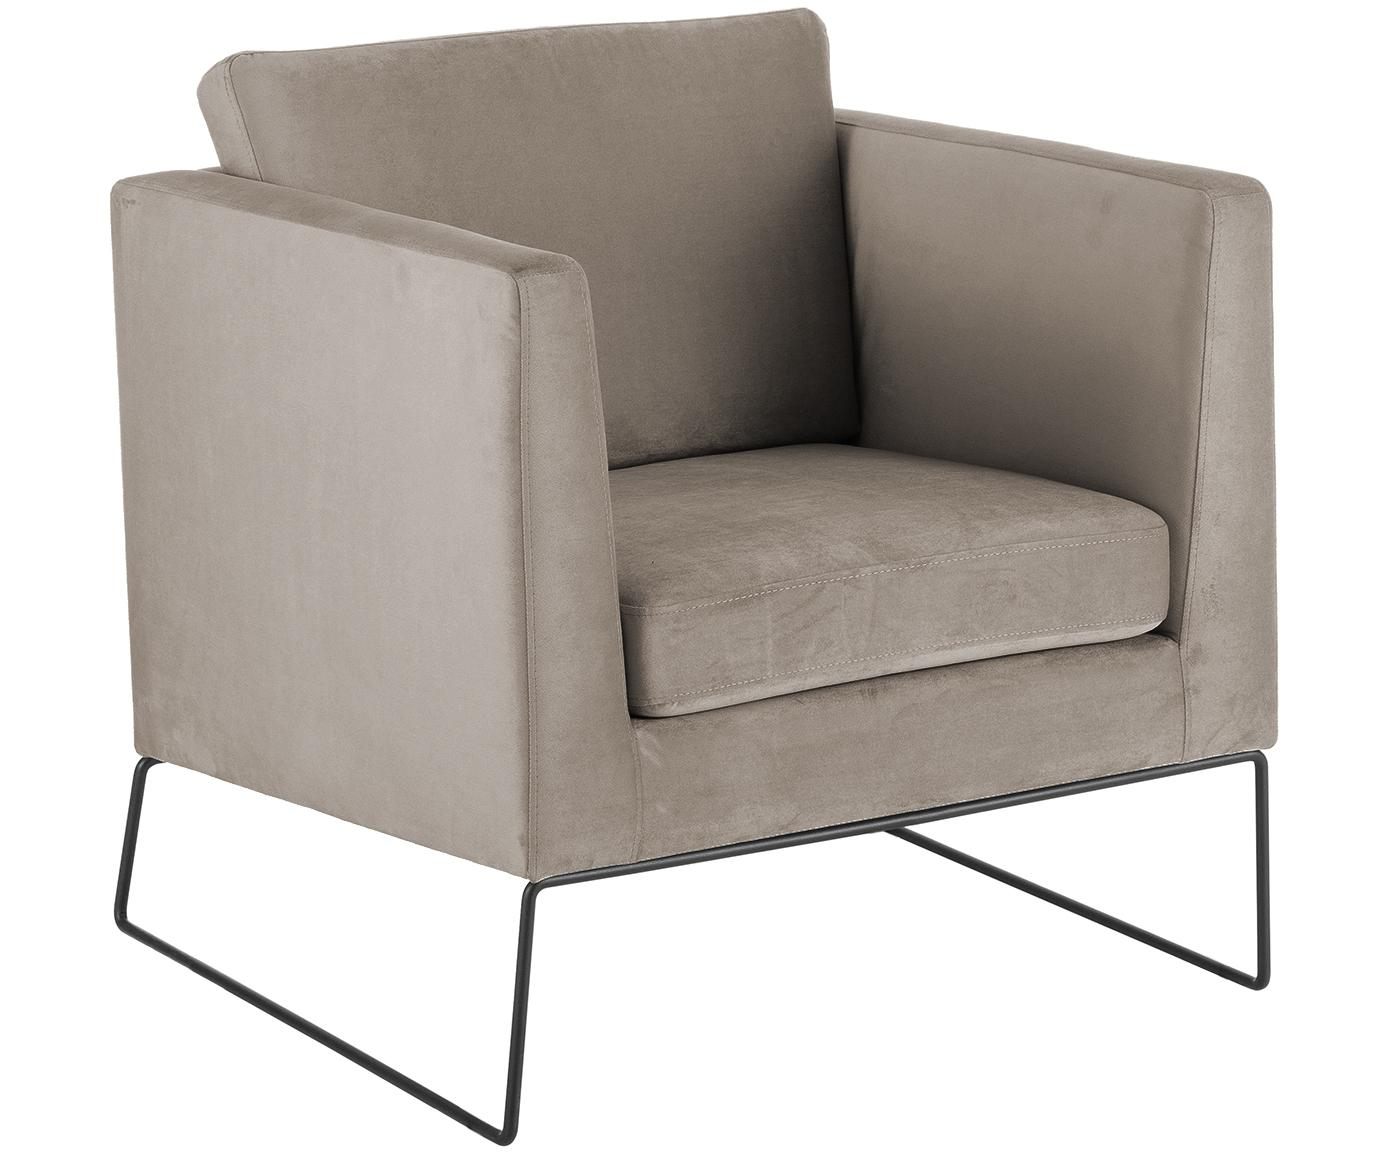 Fluwelen fauteuil Milo, Bekleding: fluweel (hoogwaardig poly, Frame: grenenhout, Poten: gelakt metaal, Taupe, 77 x 75 cm